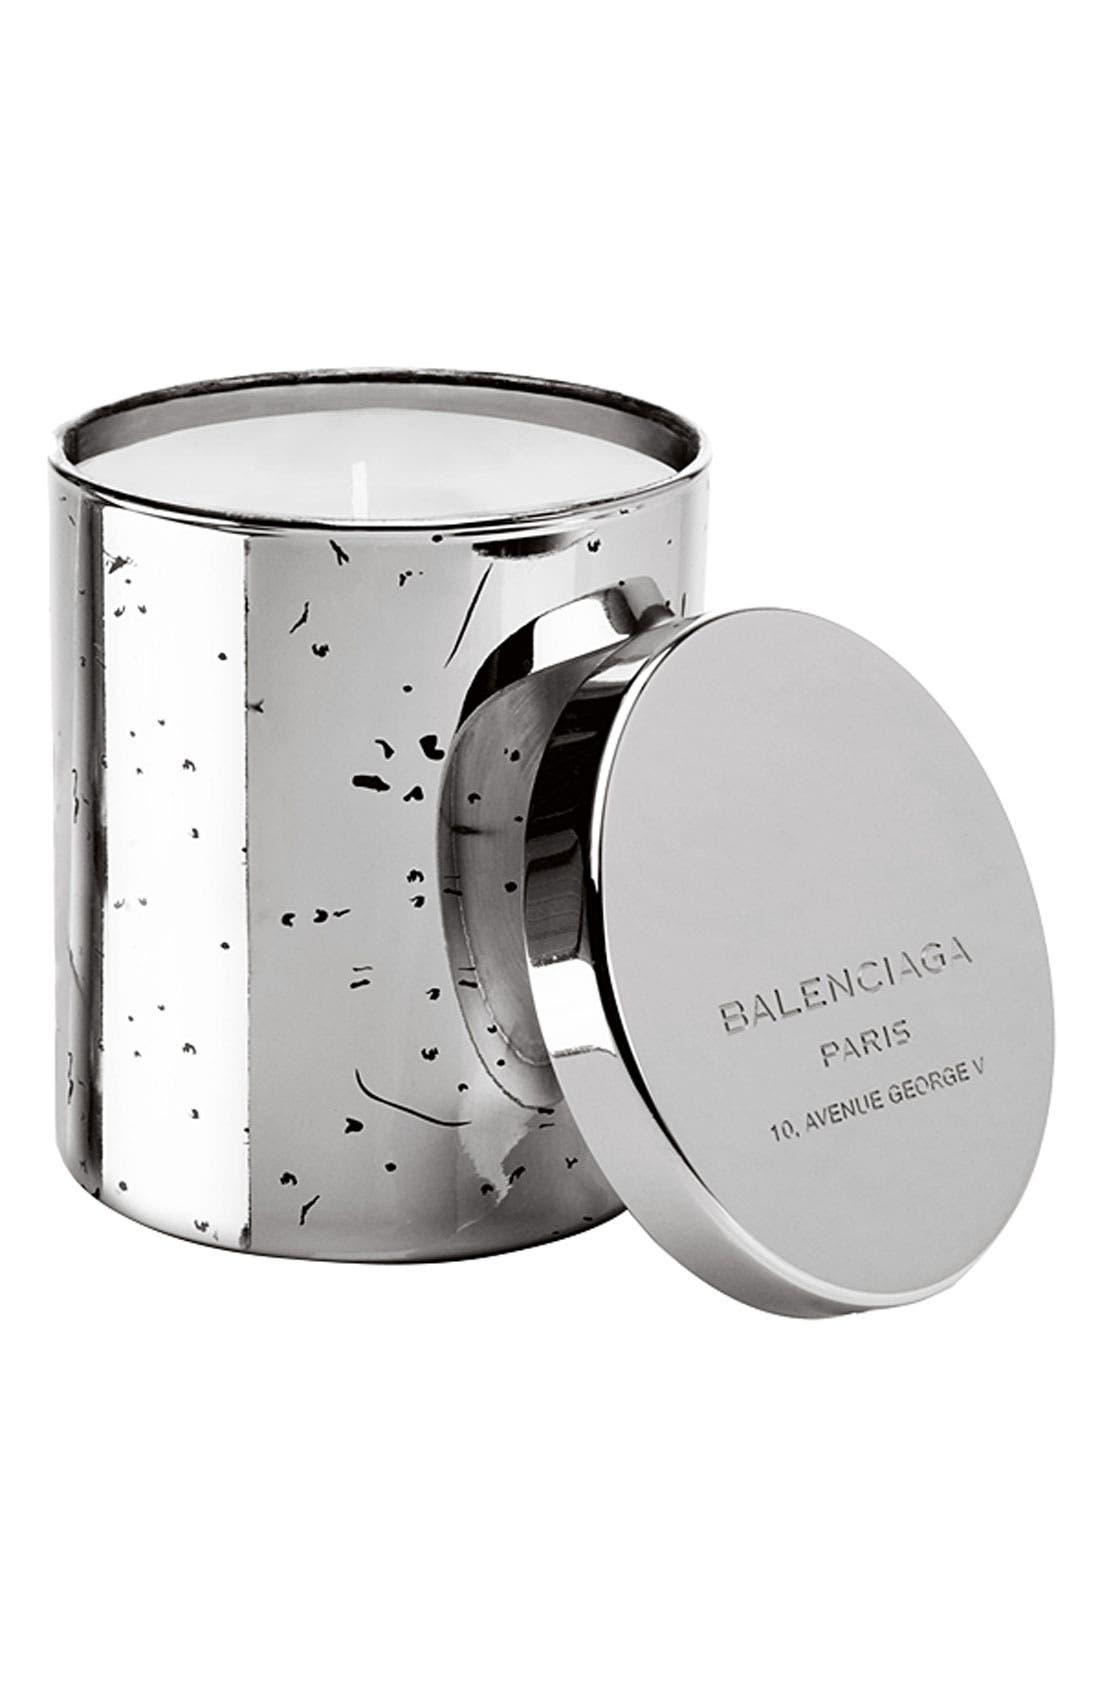 Alternate Image 1 Selected - Balenciaga Paris 'L'Essence' Candle